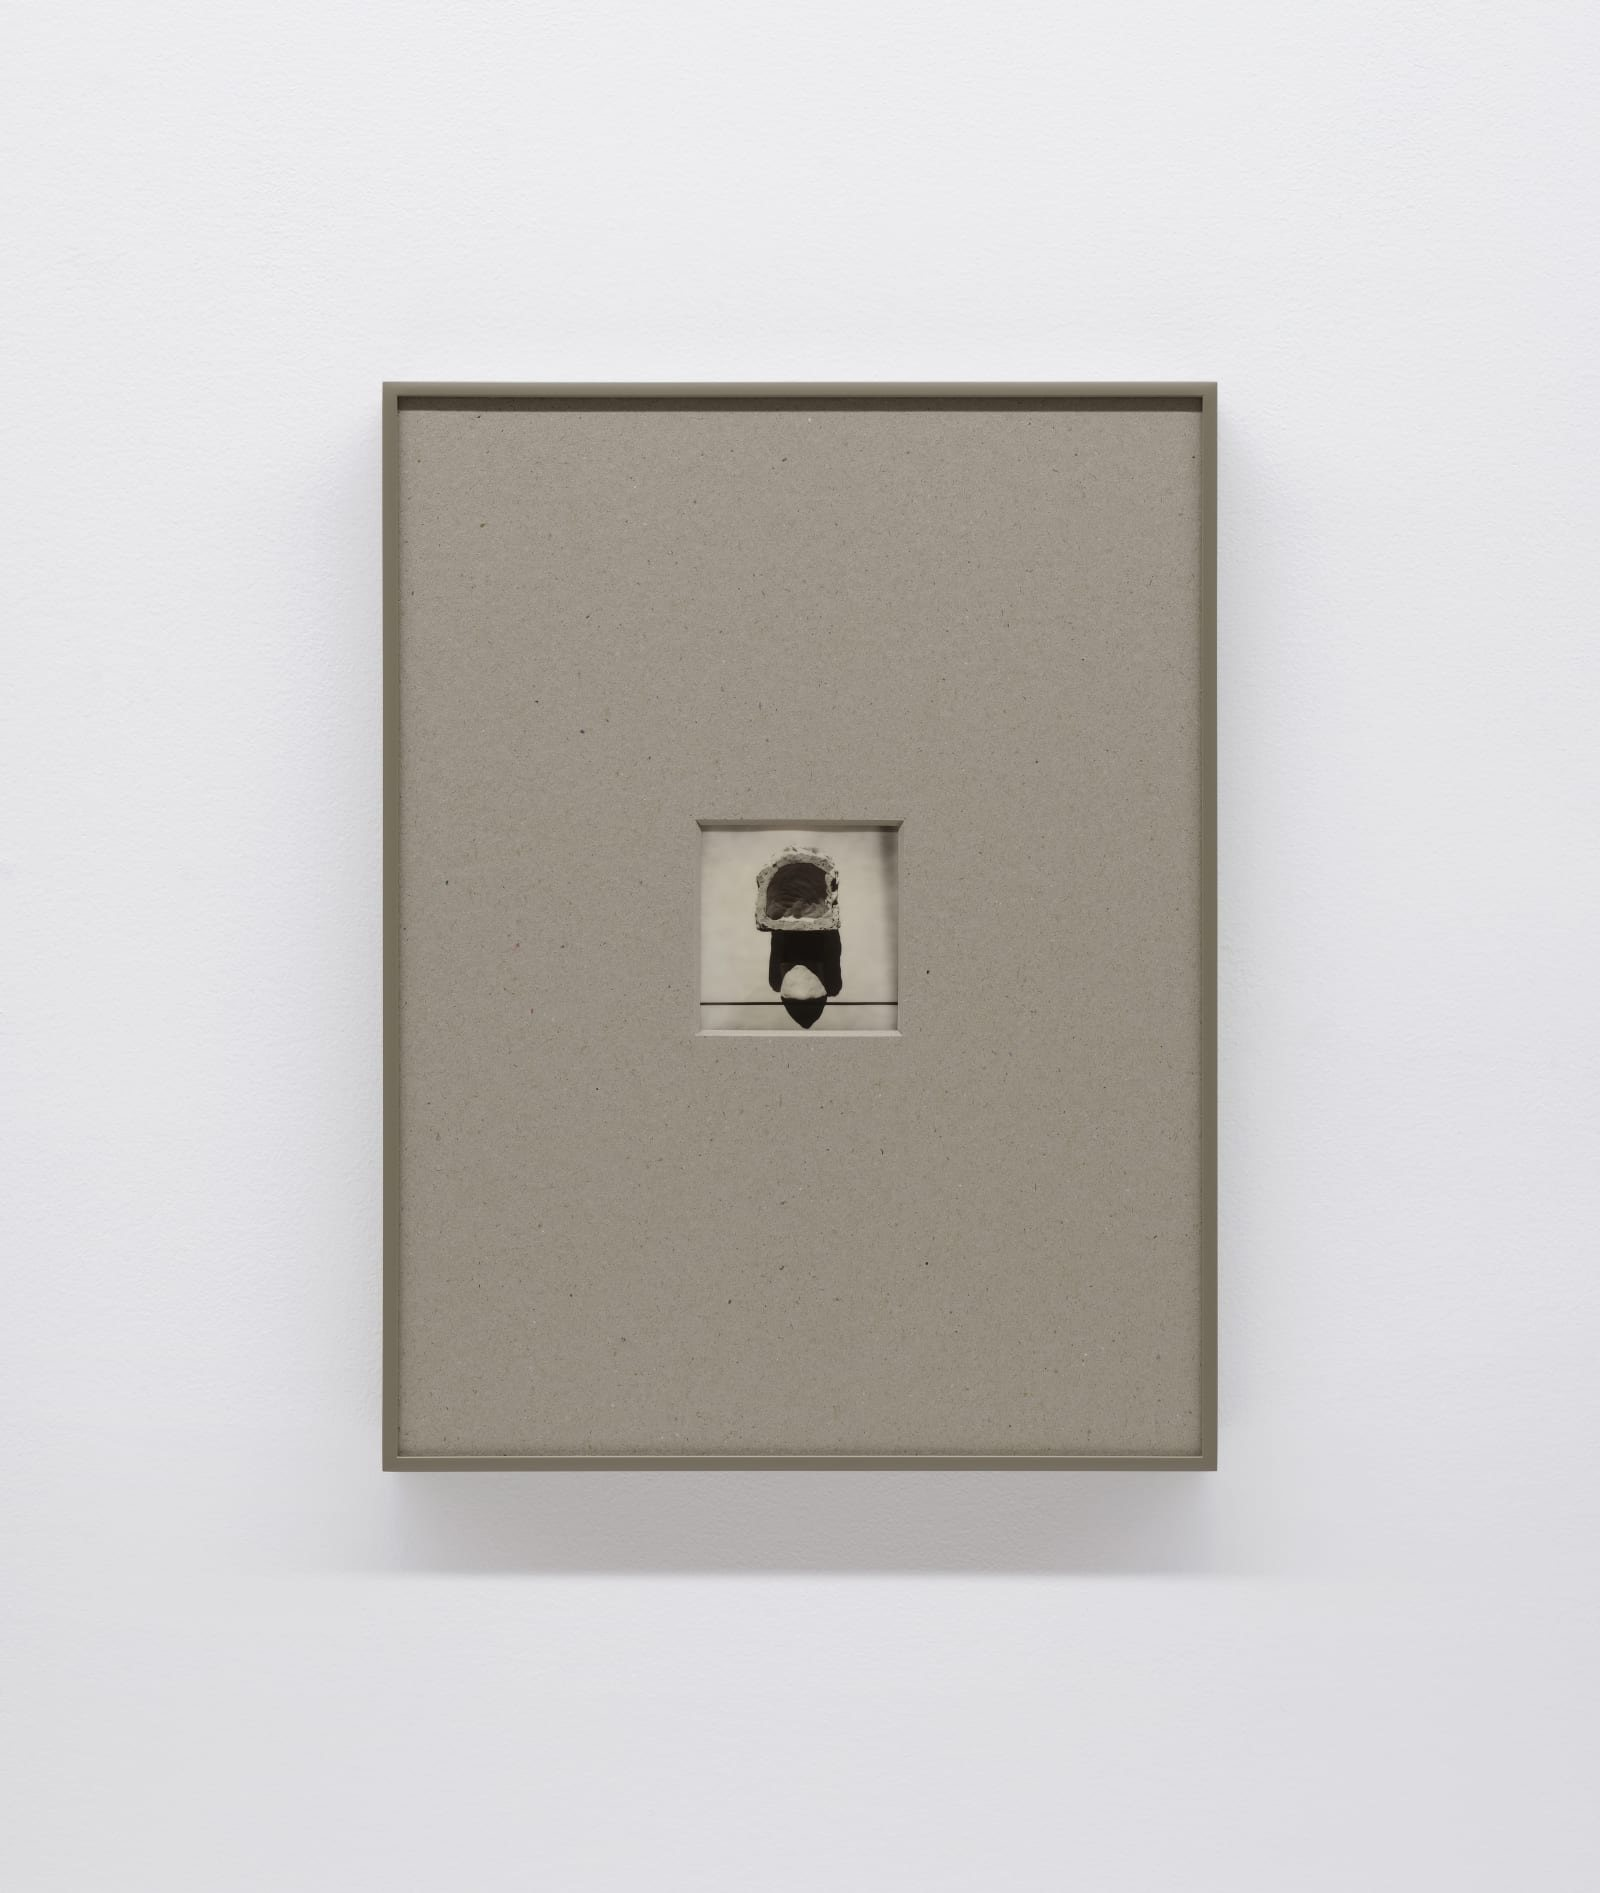 Elision i8 Gallery